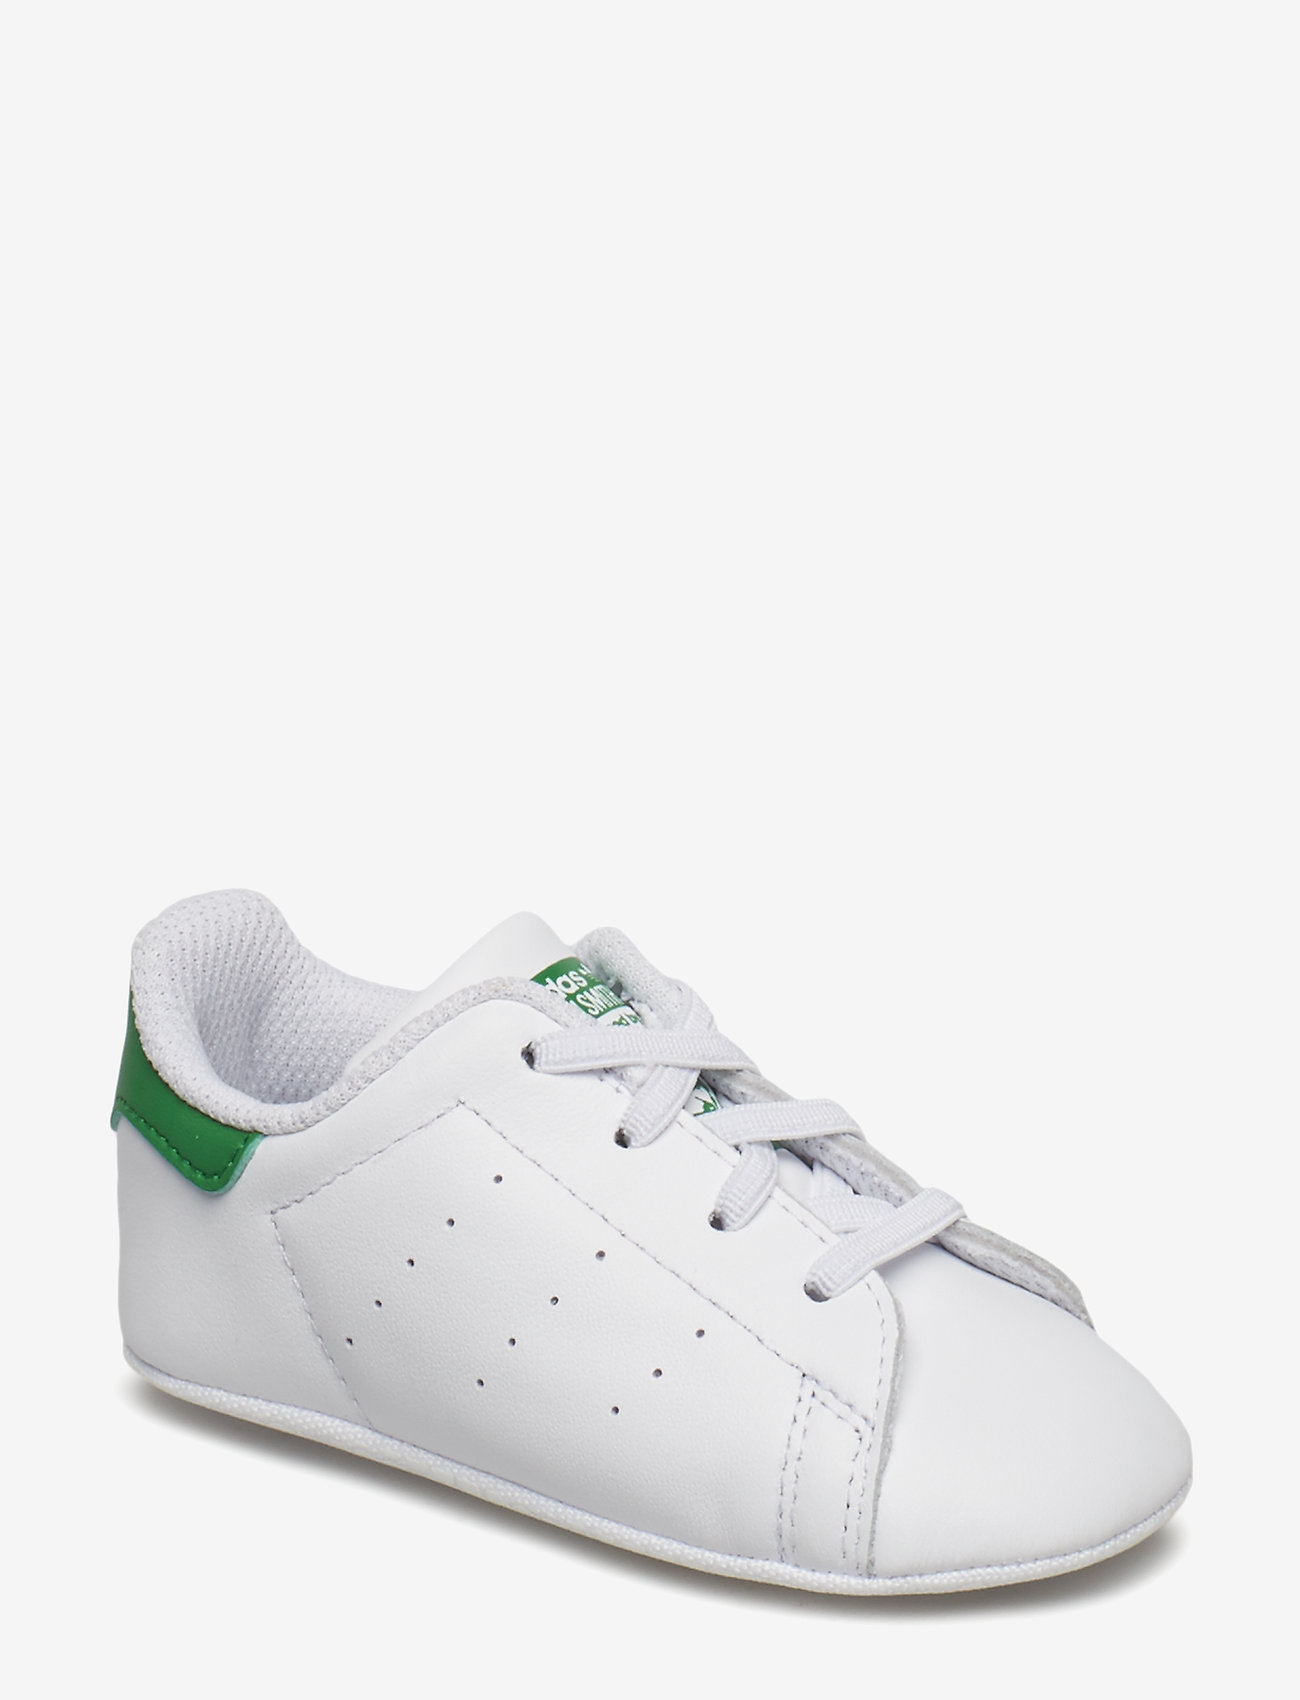 adidas Originals - Stan Smith - hausschuhe - ftwwht/ftwwht/green - 0